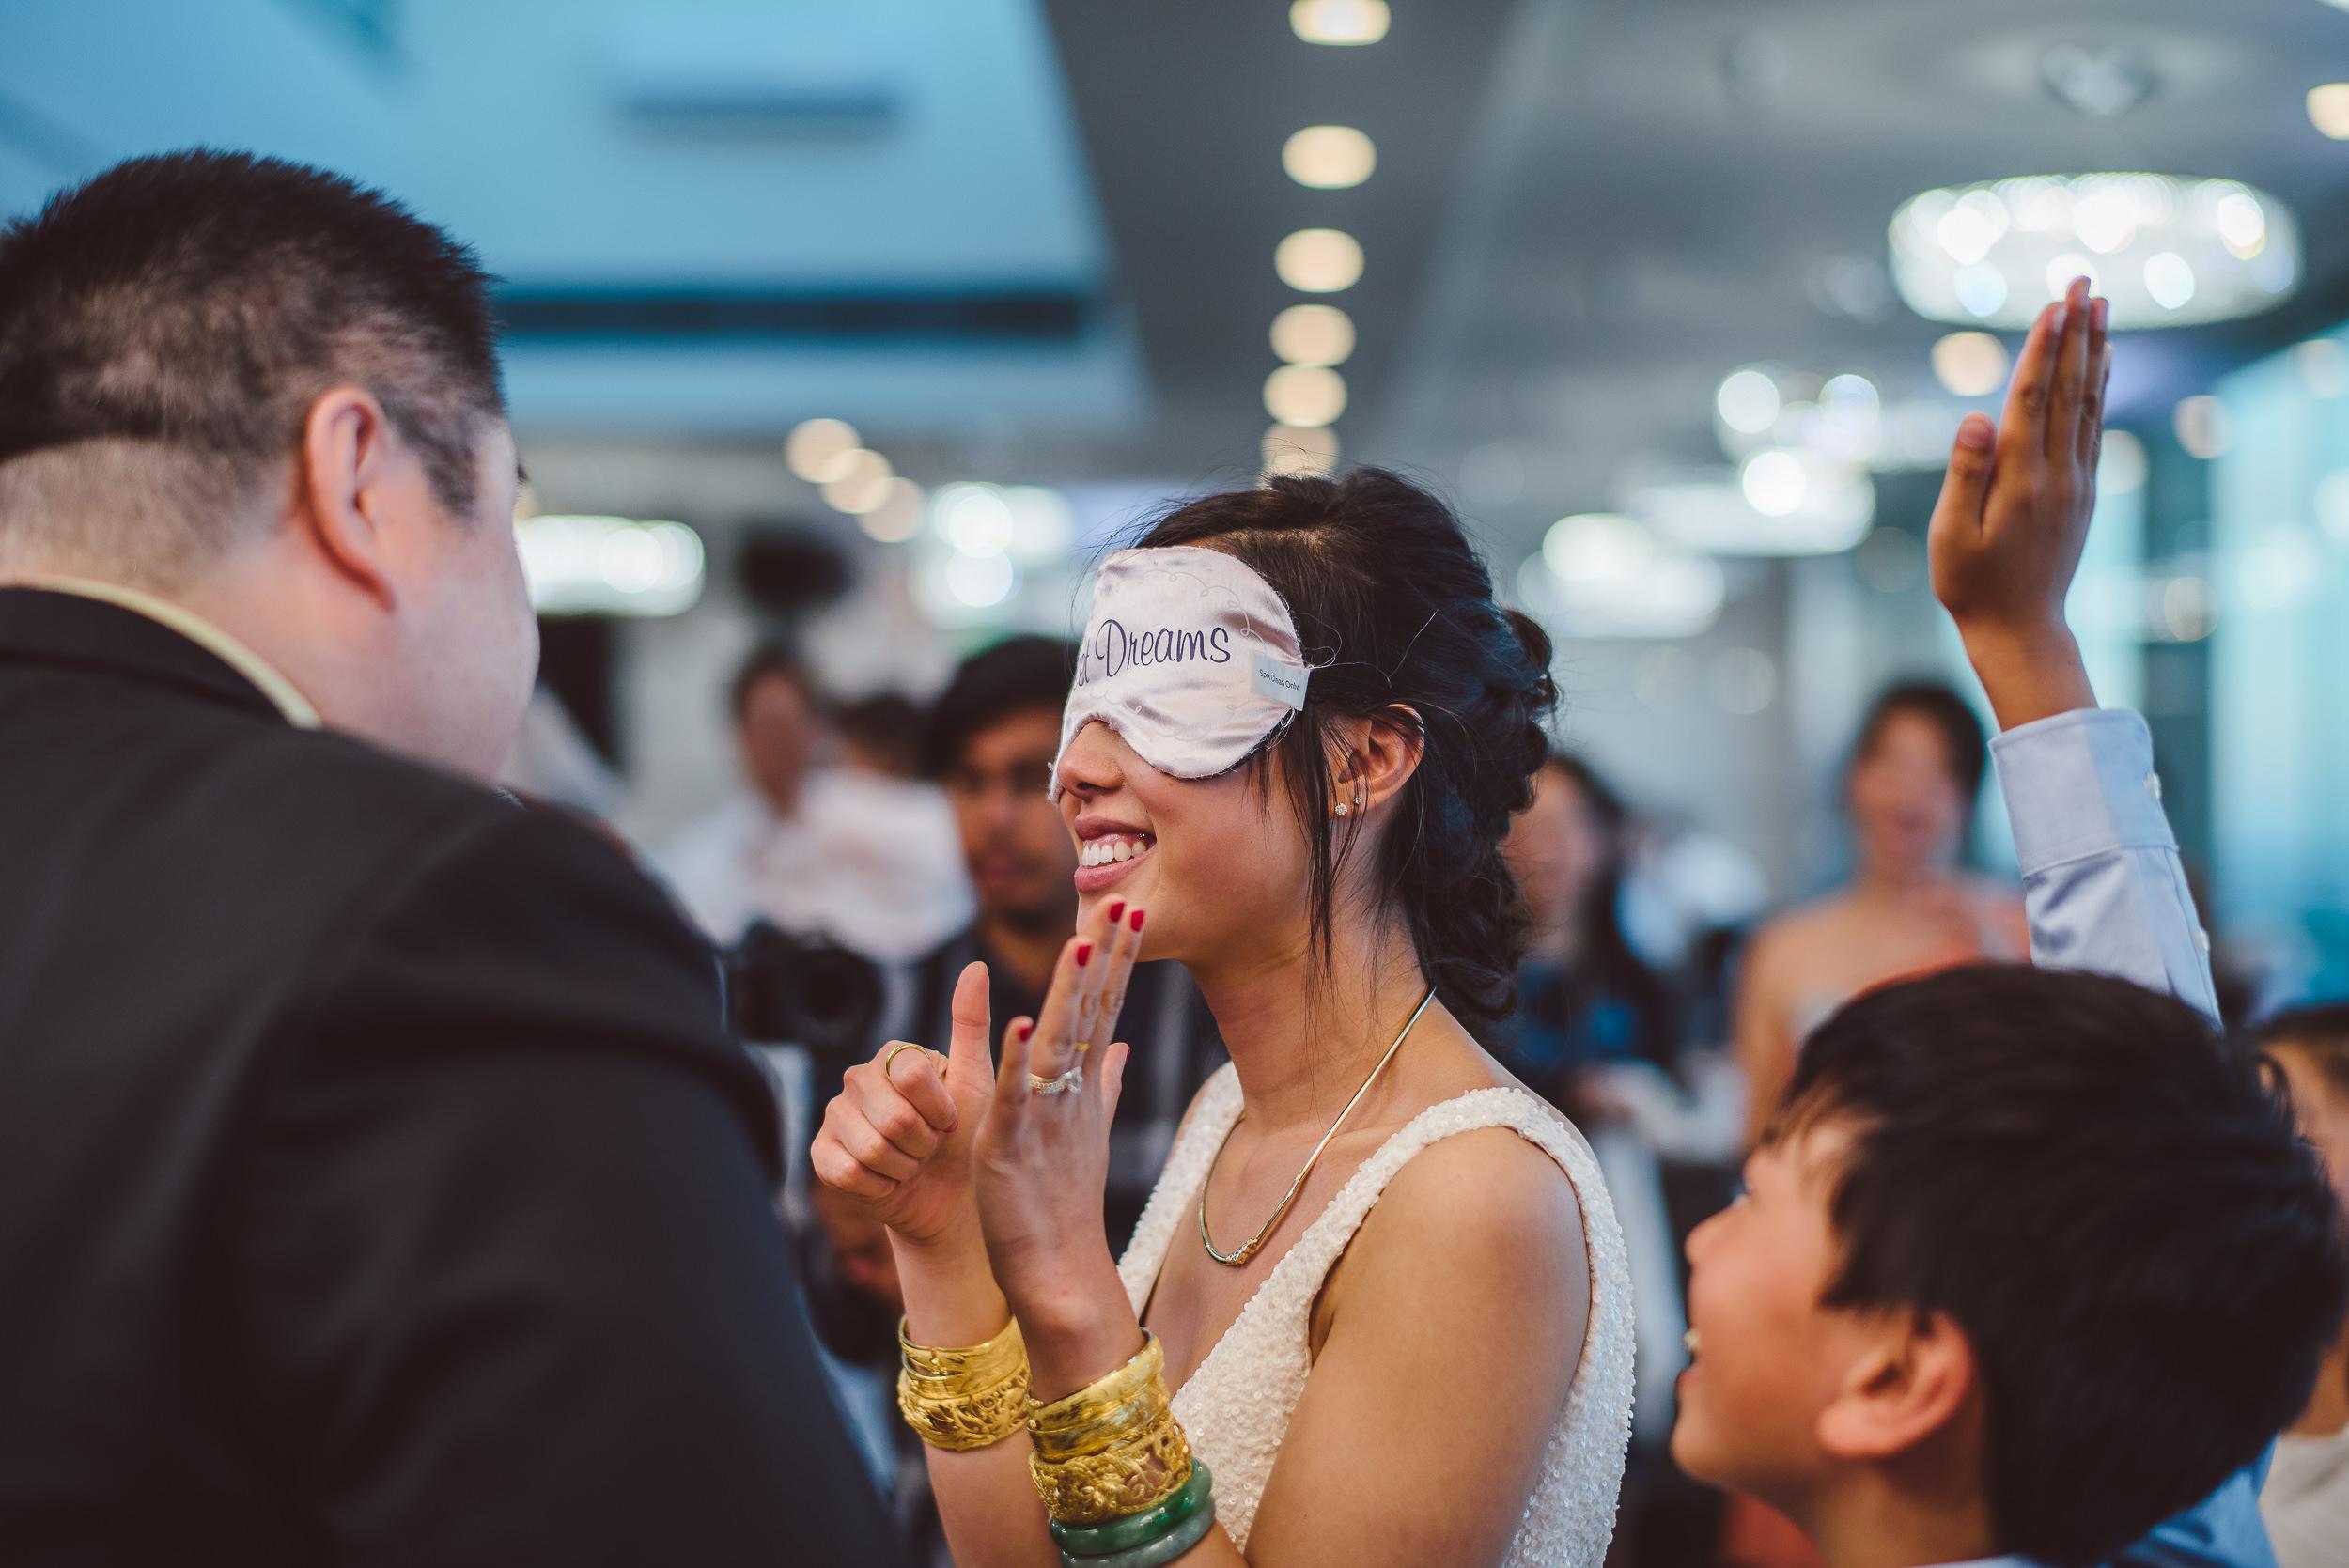 Loews-Regency-San-Francisco-Wedding-Photography-064.jpg